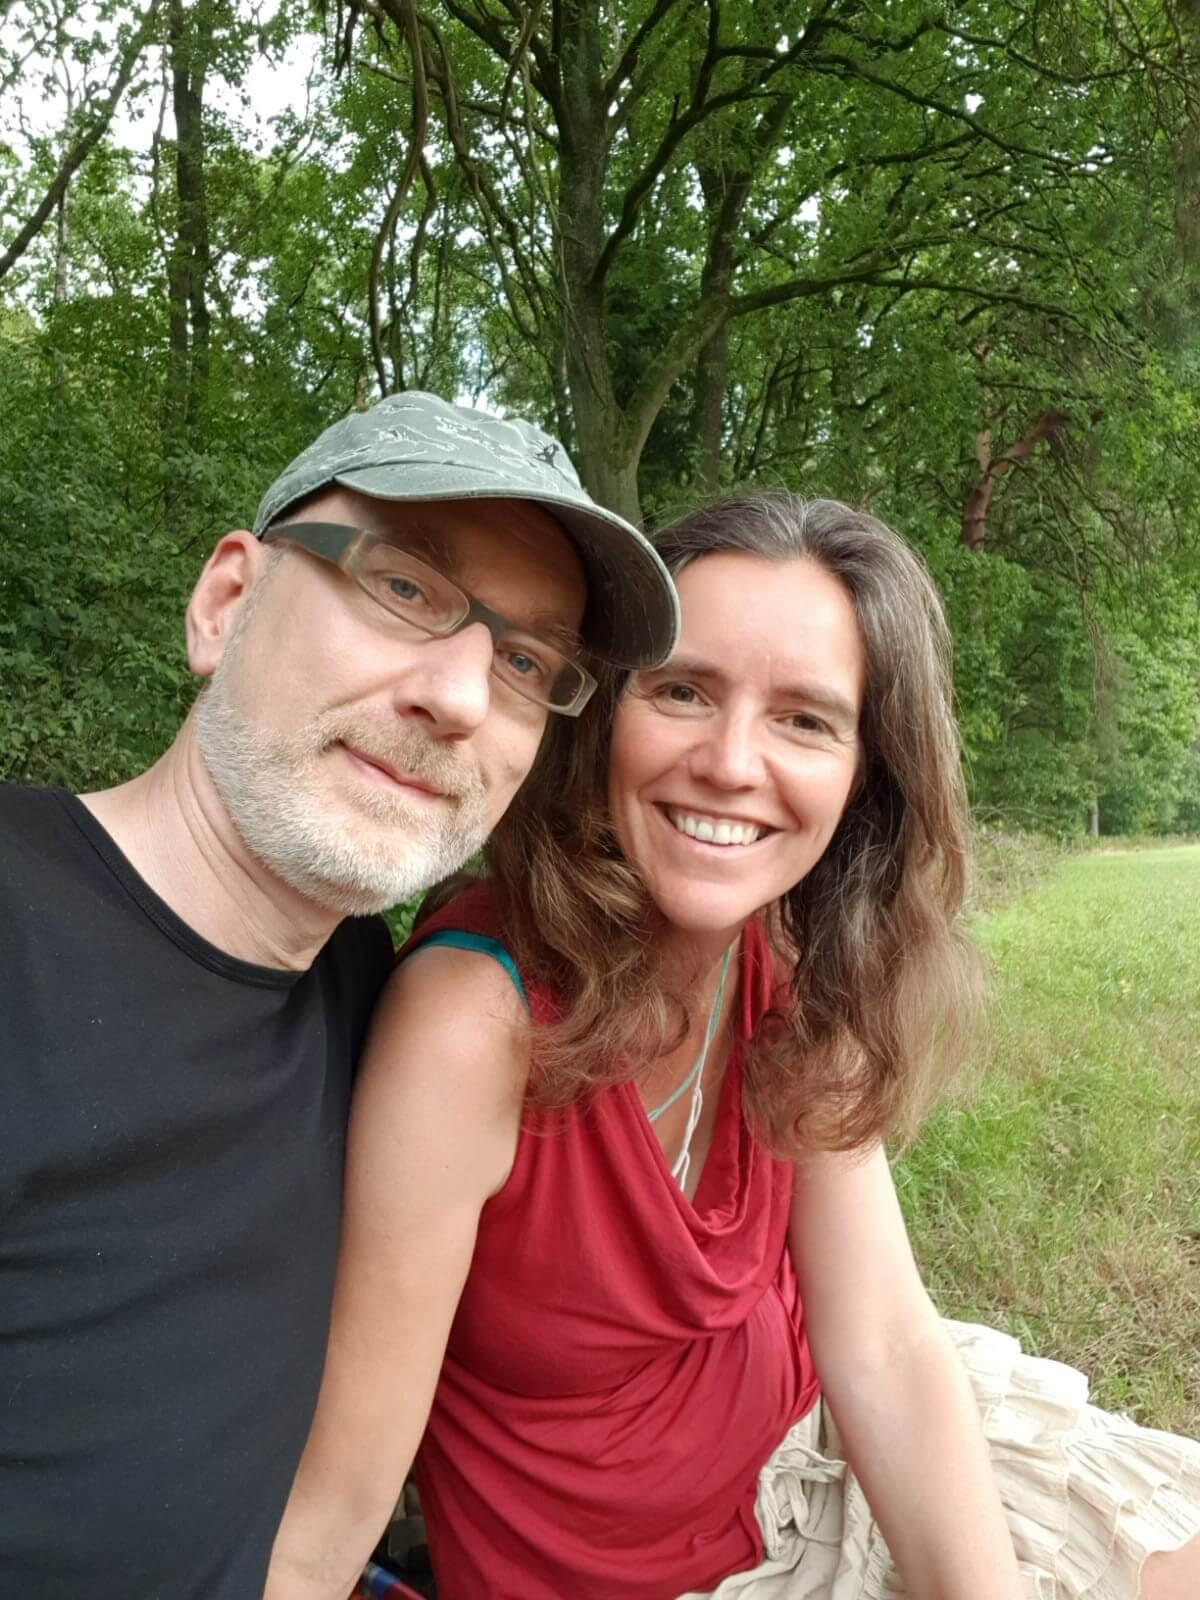 The power of love – man / vrouw essentie en seksualiteit